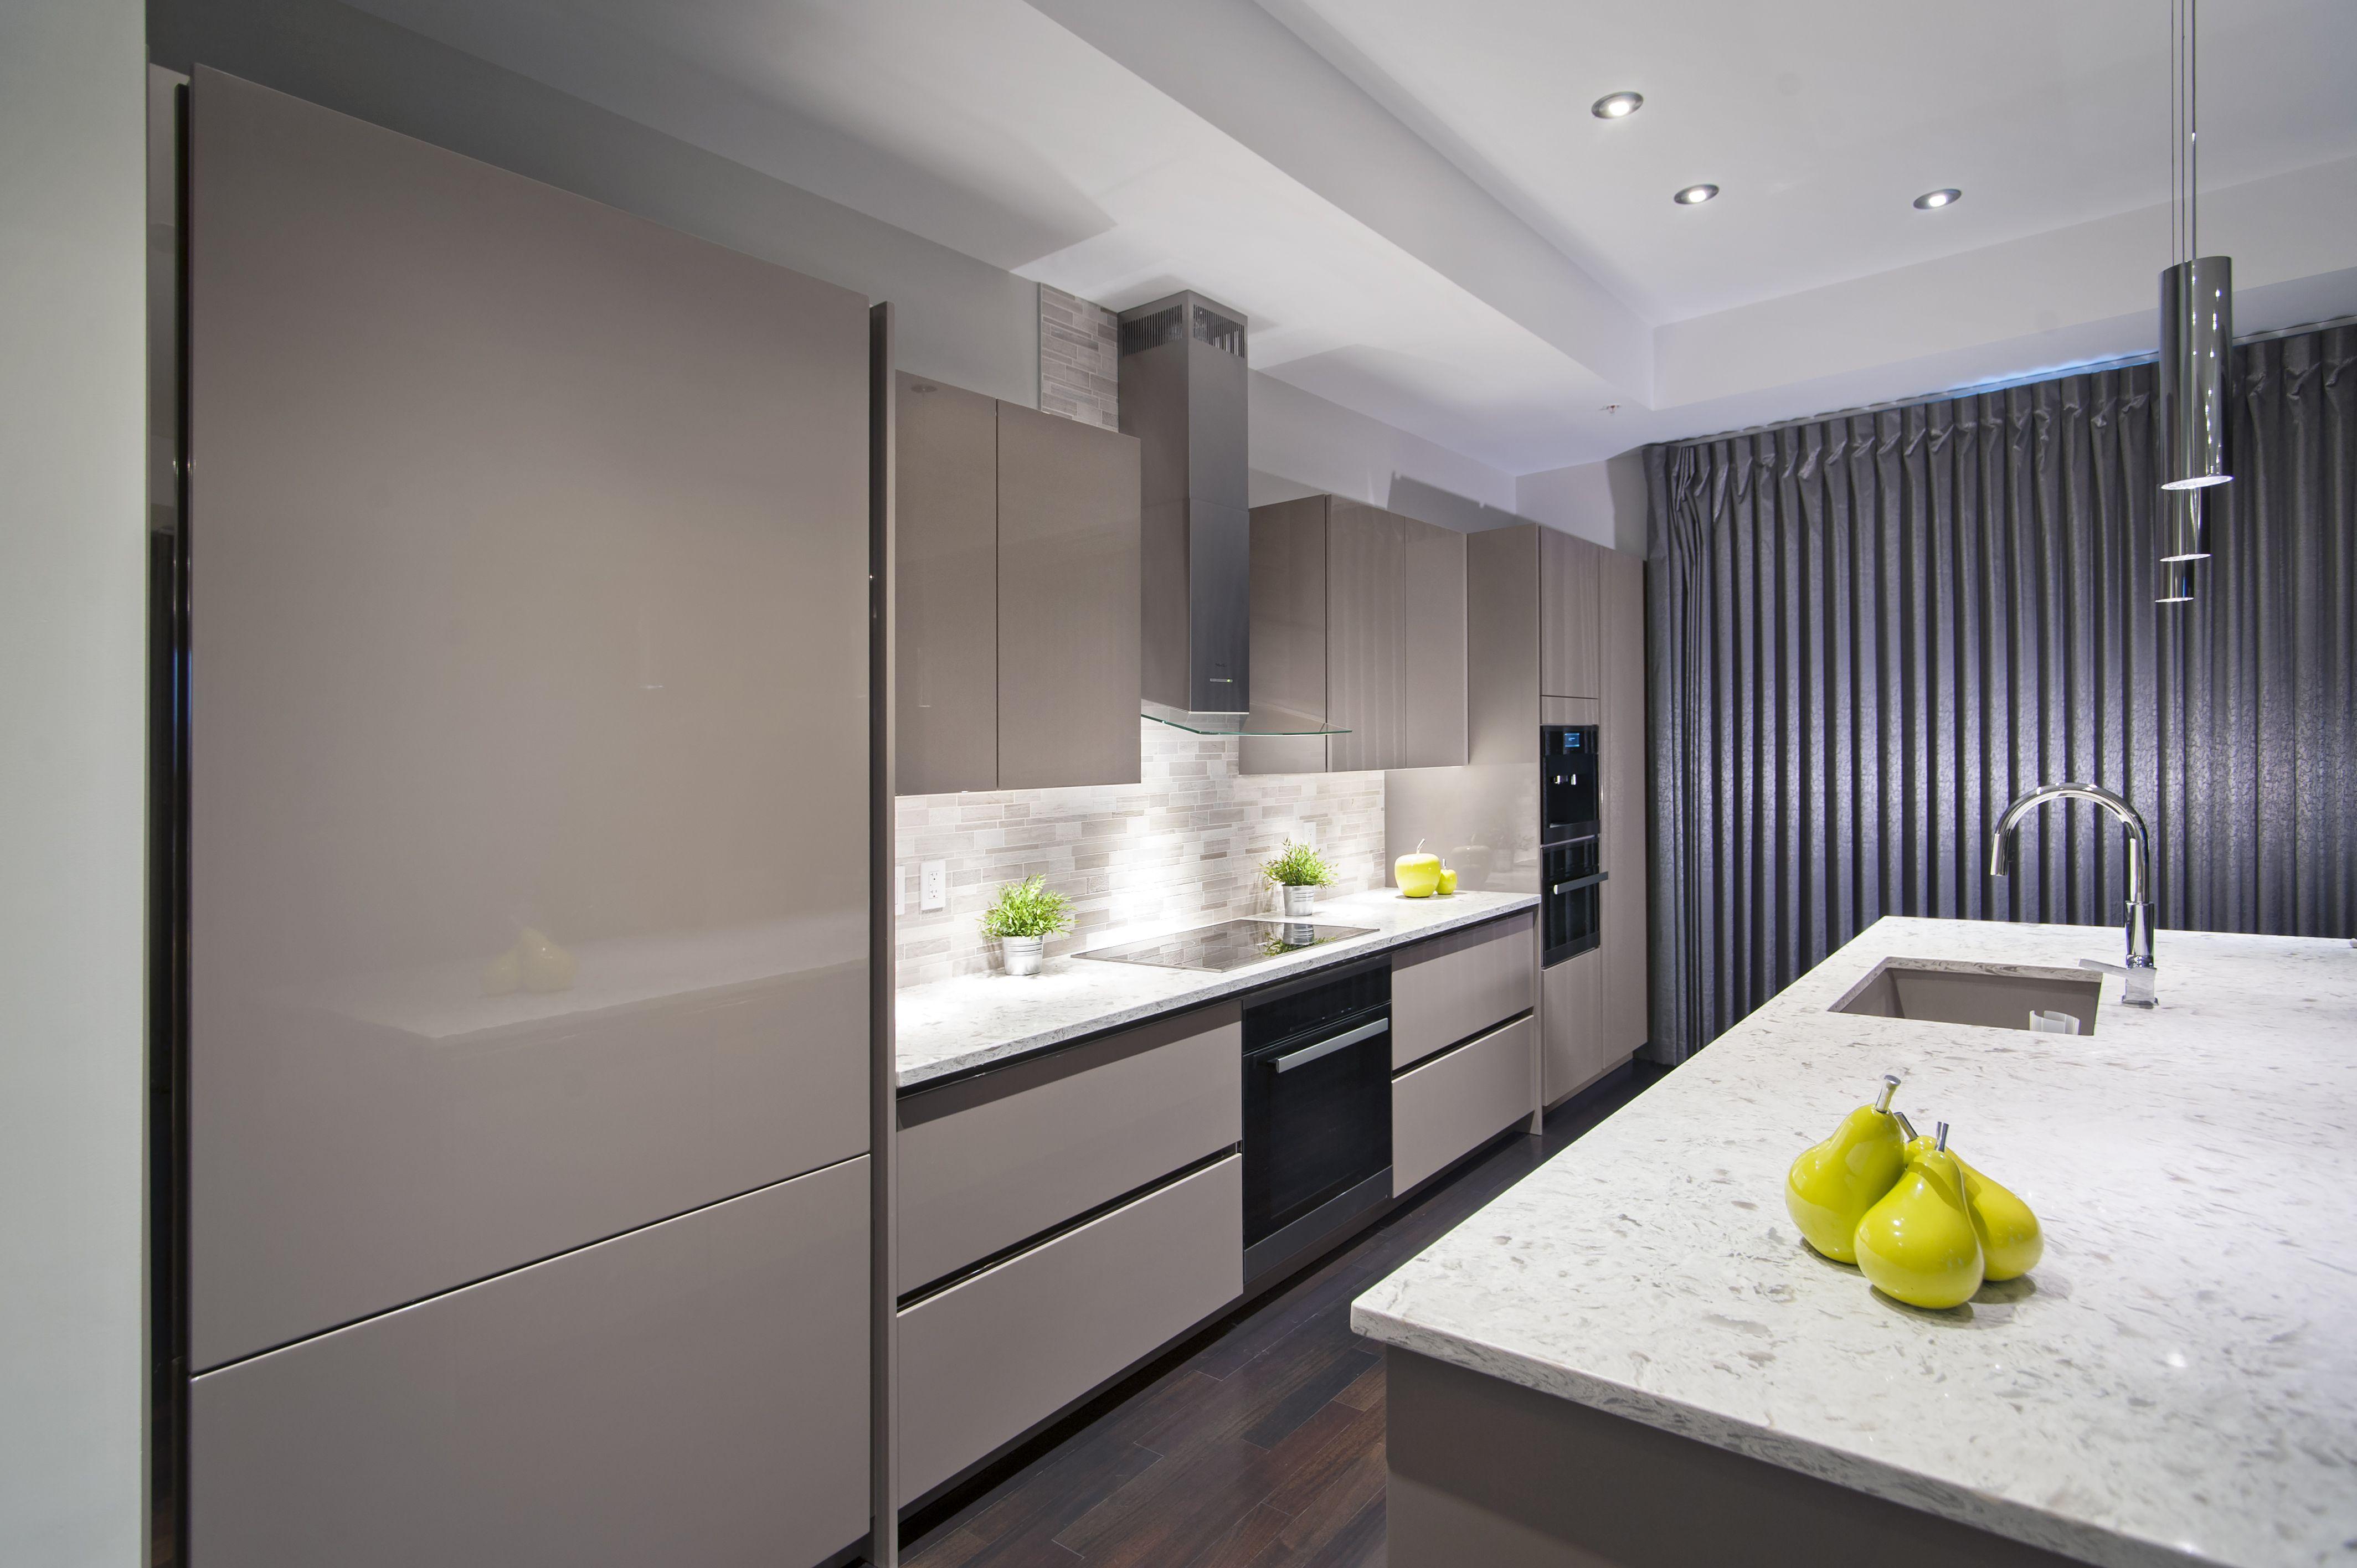 High Gloss Kitchen 2 Kitchen Projects Modern Kitchen Design High Gloss Kitchen